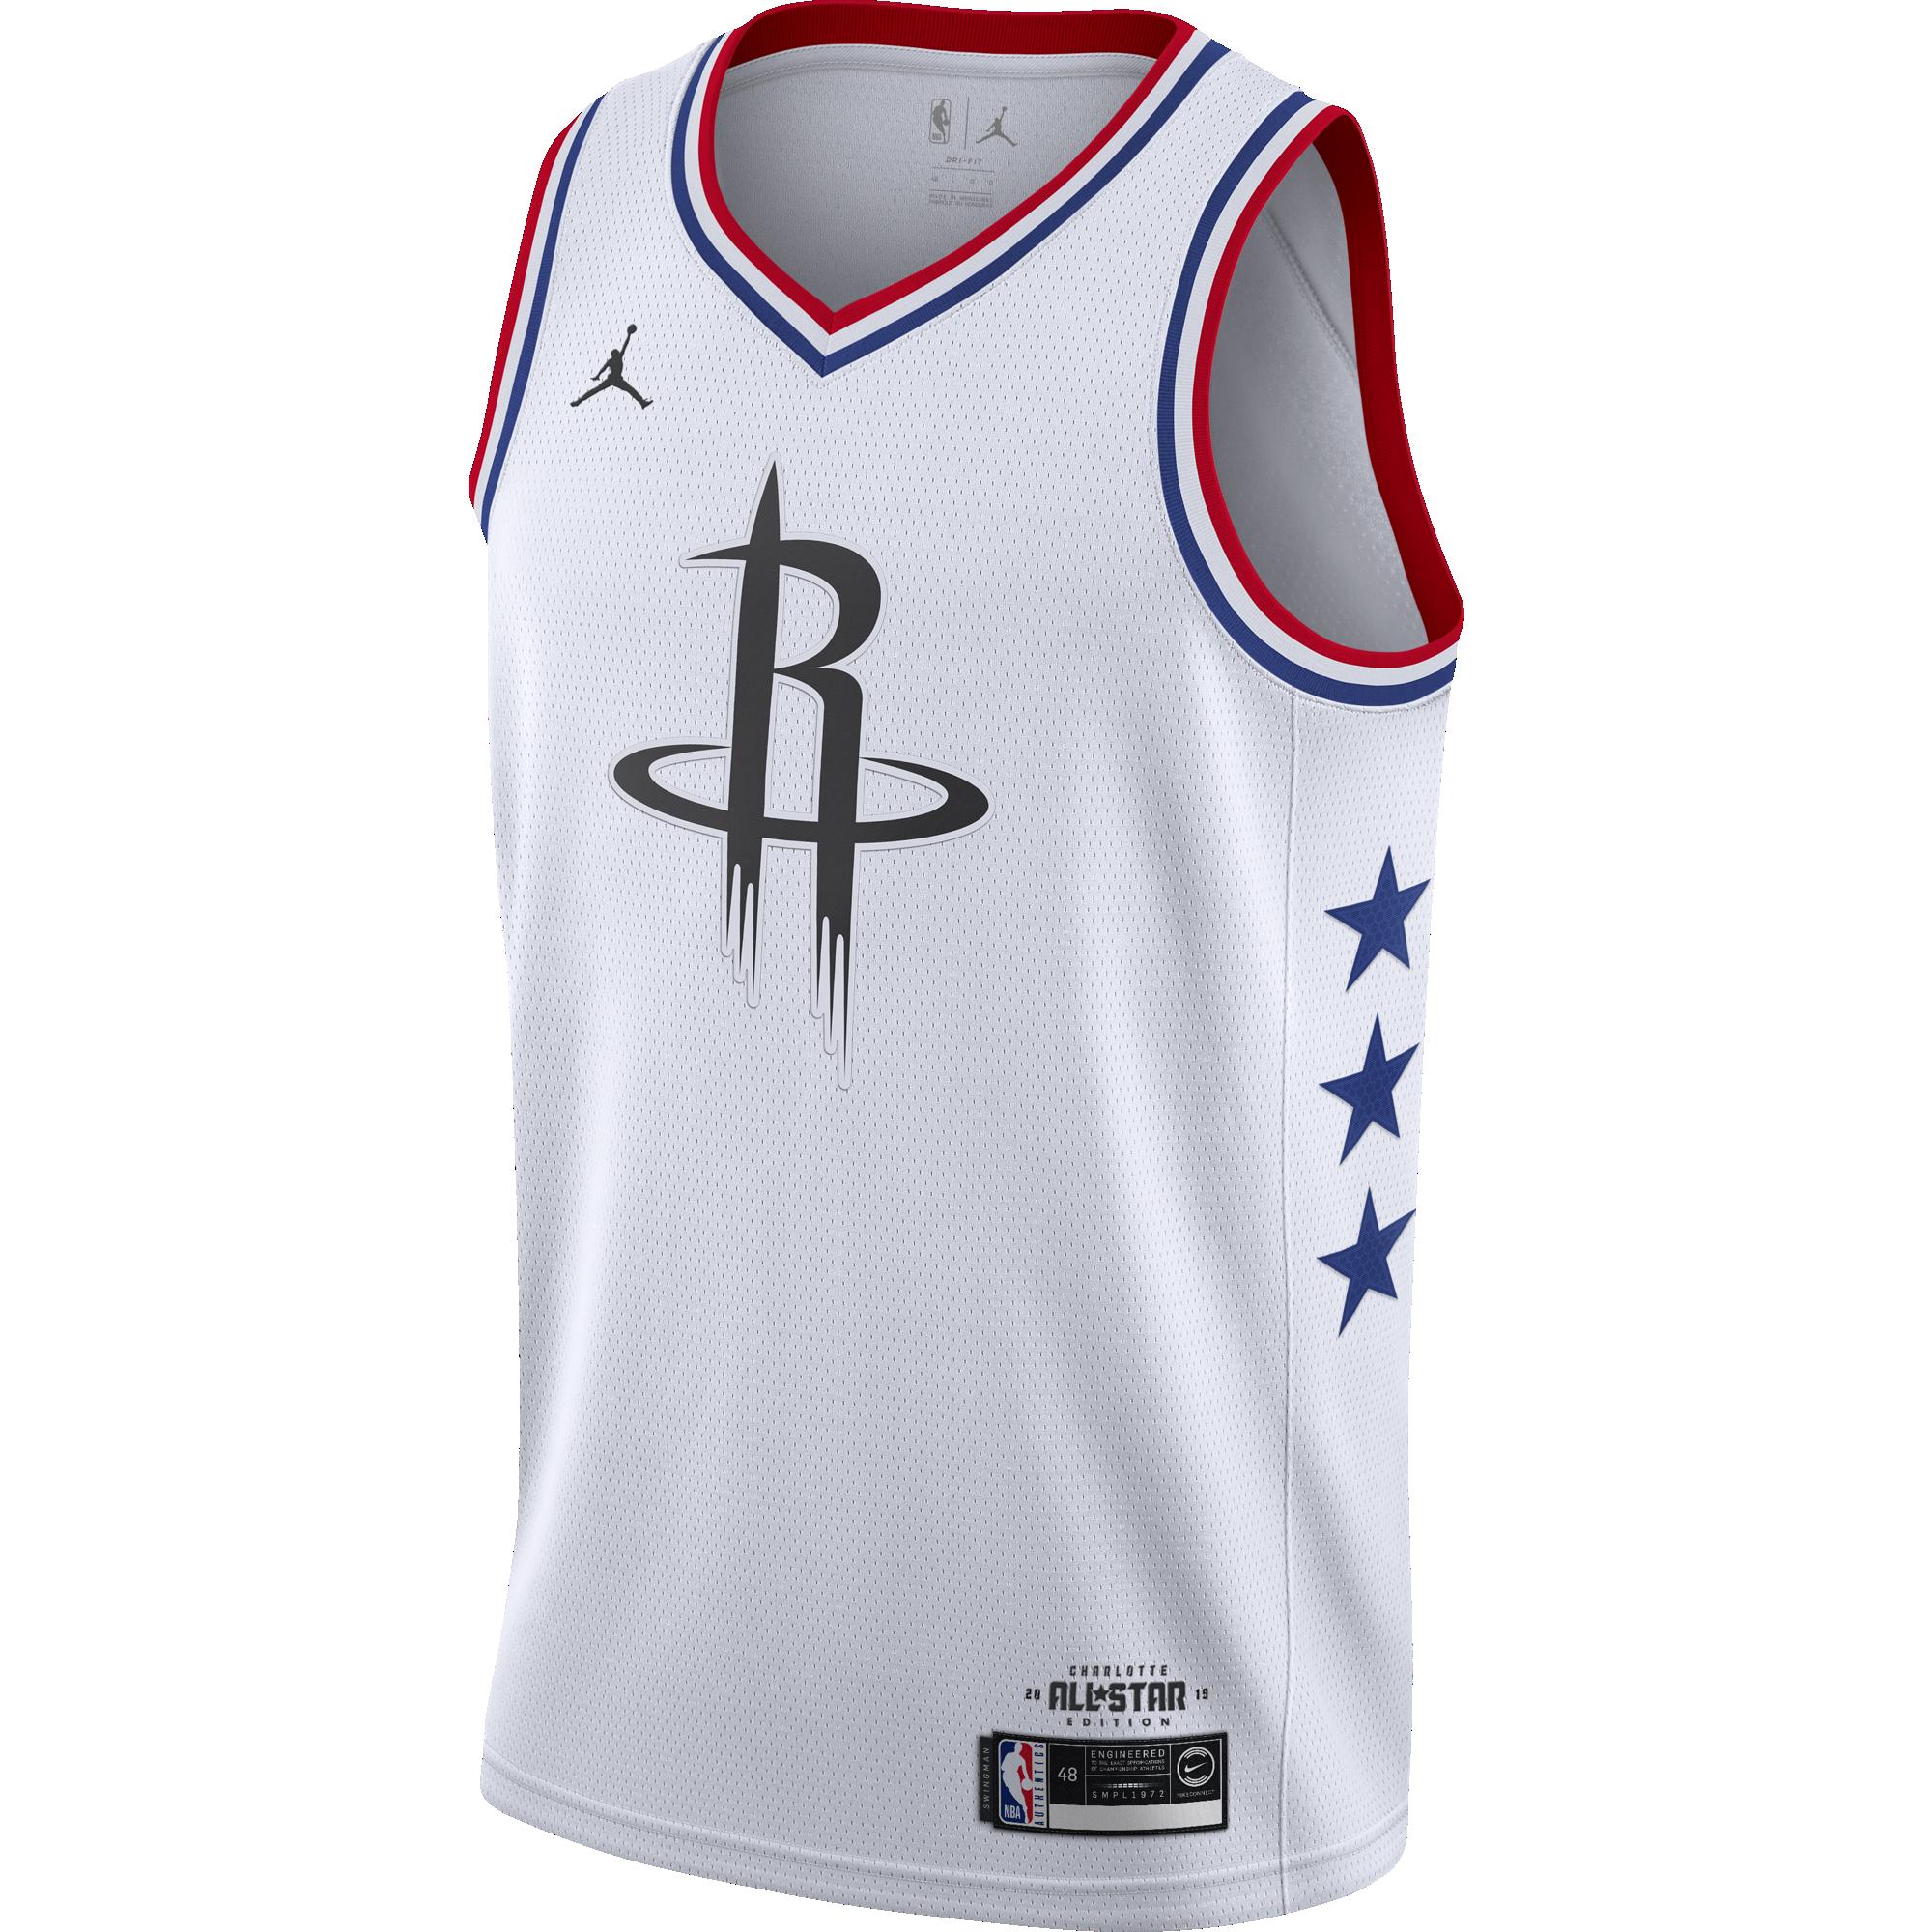 new style 5d477 1cd78 AIR JORDAN NBA ALL STAR WEEKEND 2019 JAMES HARDEN SWINGMAN ...